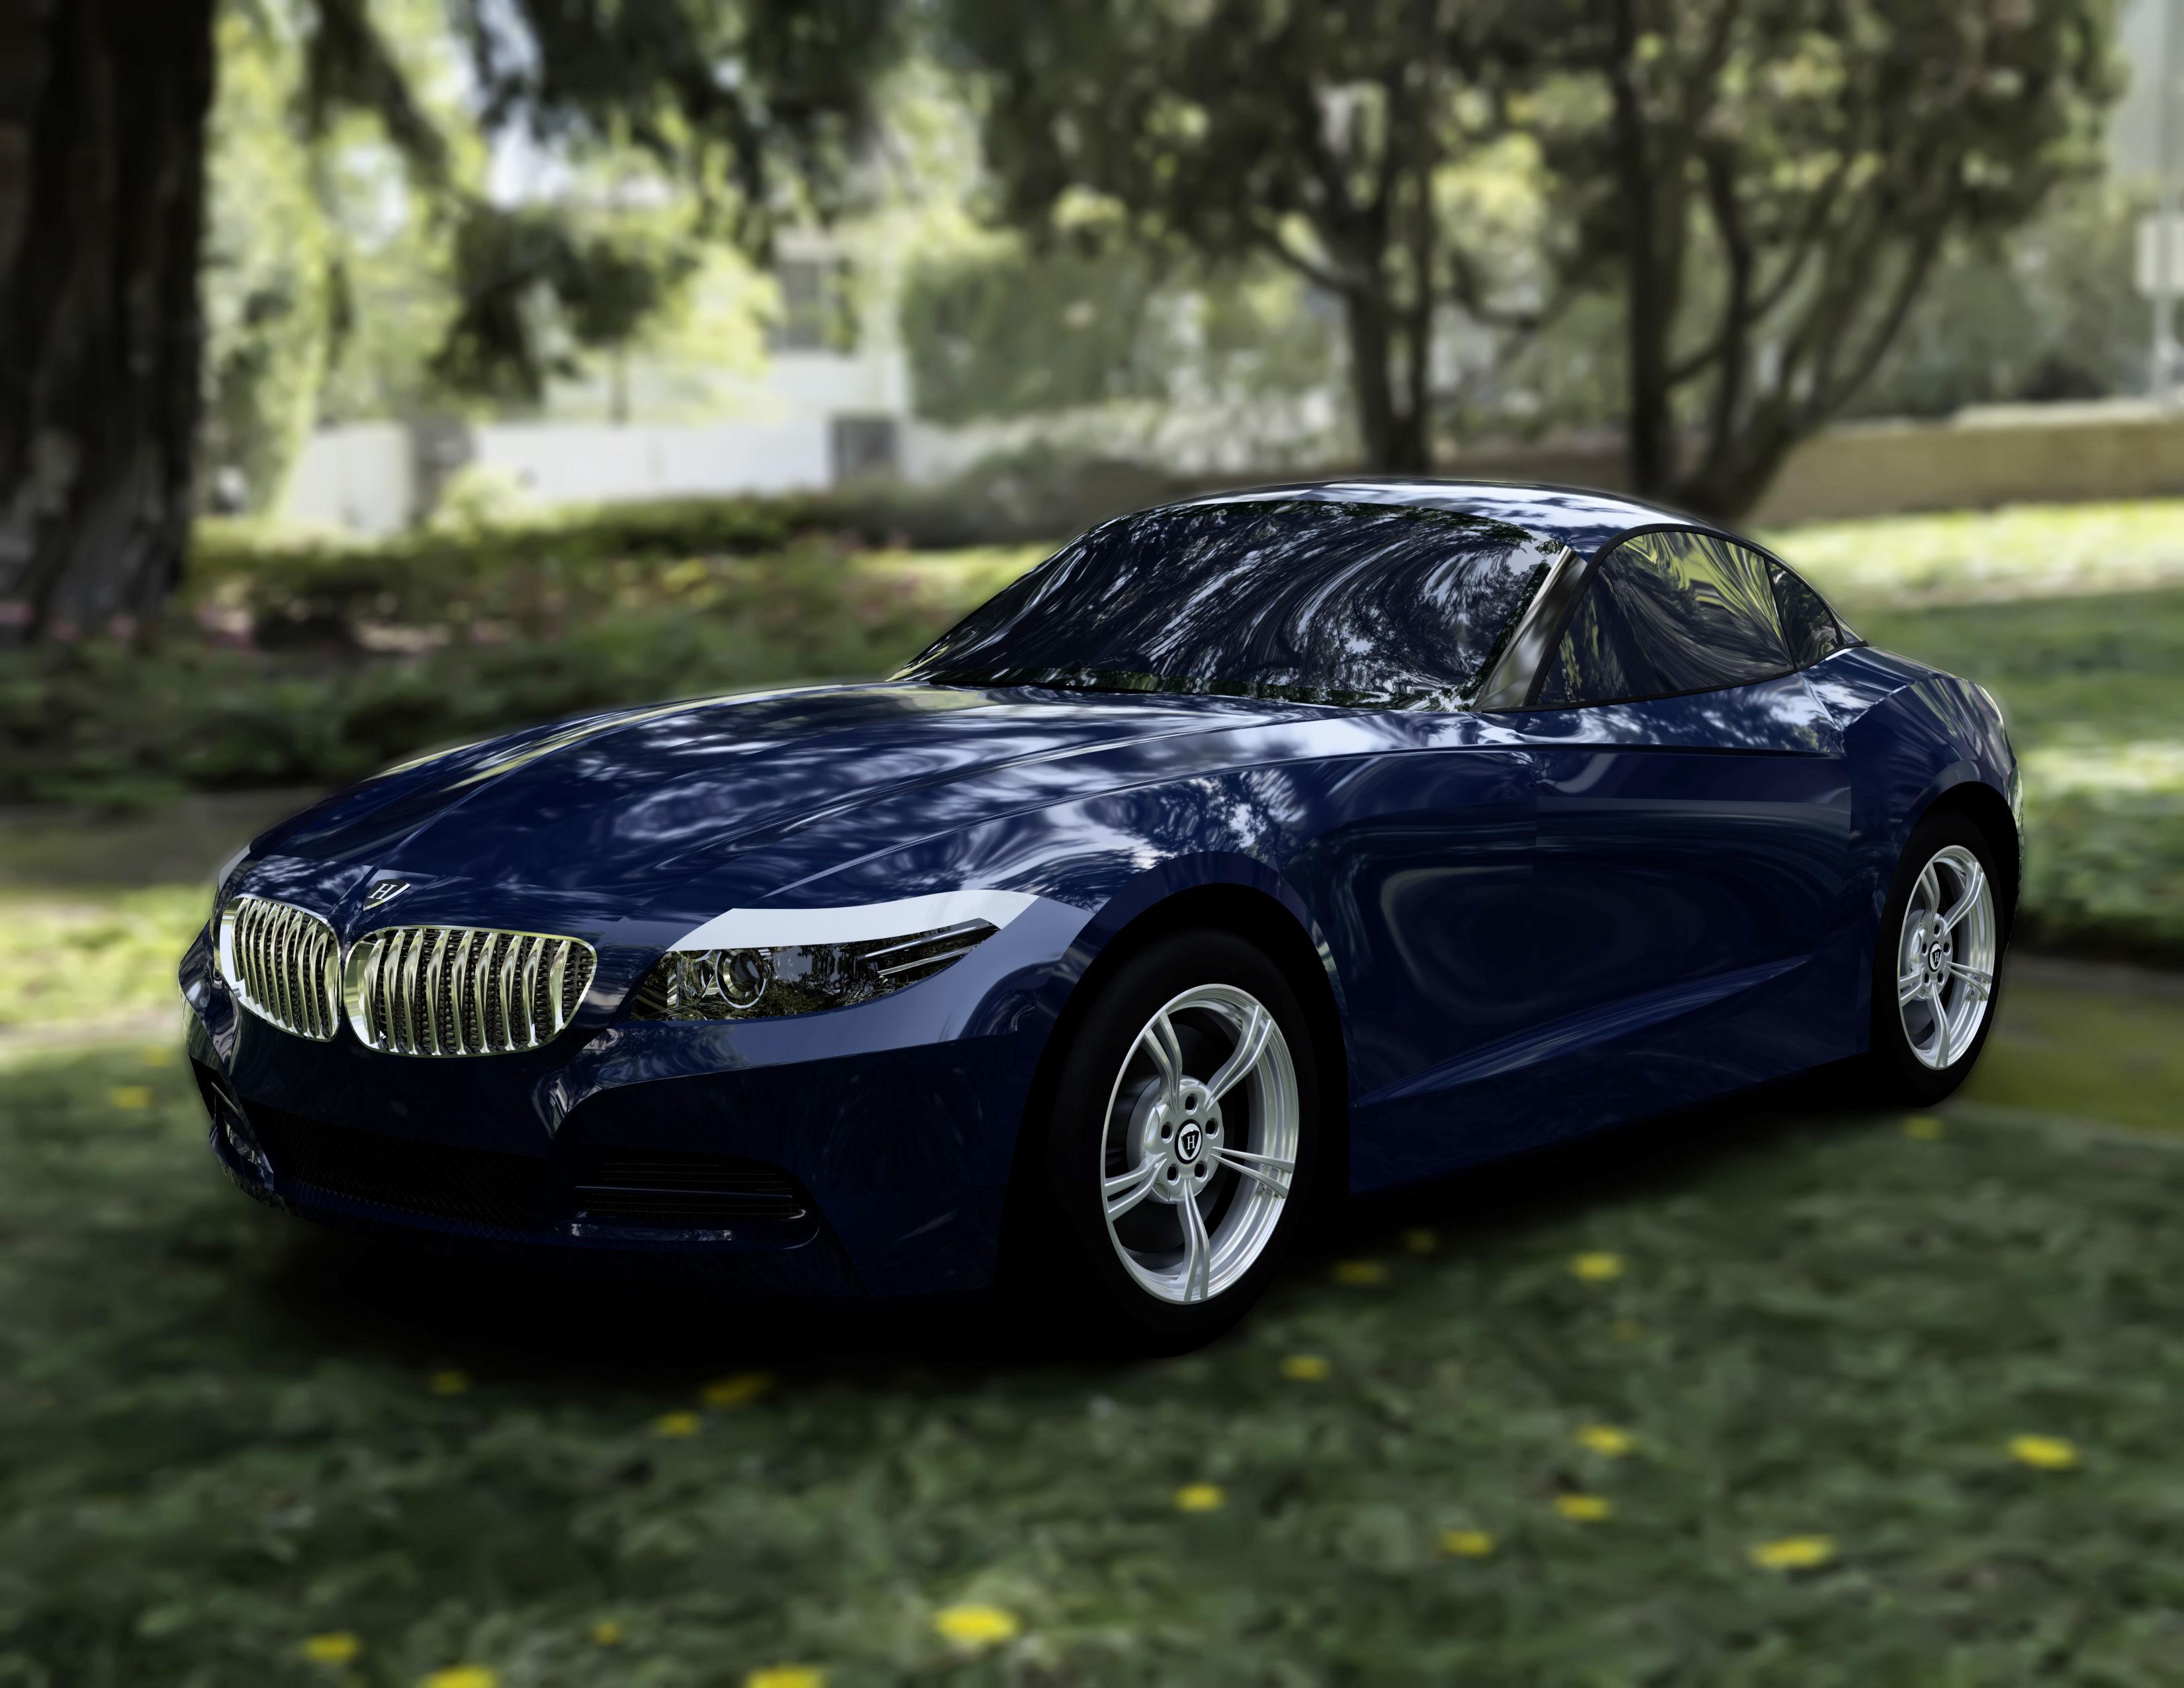 Bmw-blu-1-3500-3500